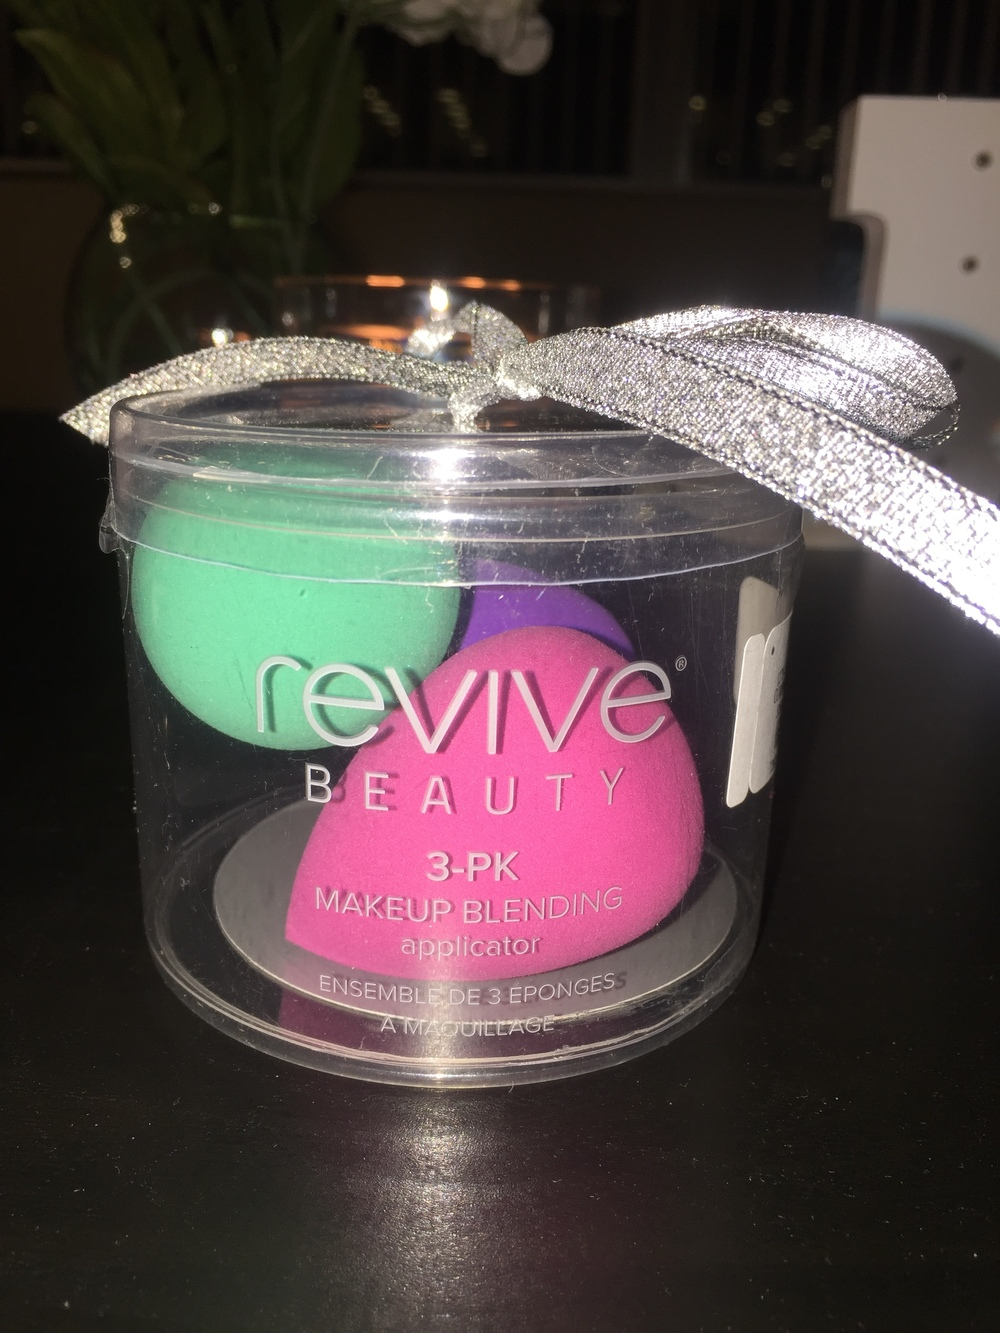 Revive Beauty 3-Pack Makeup Blending Applicator Sponges